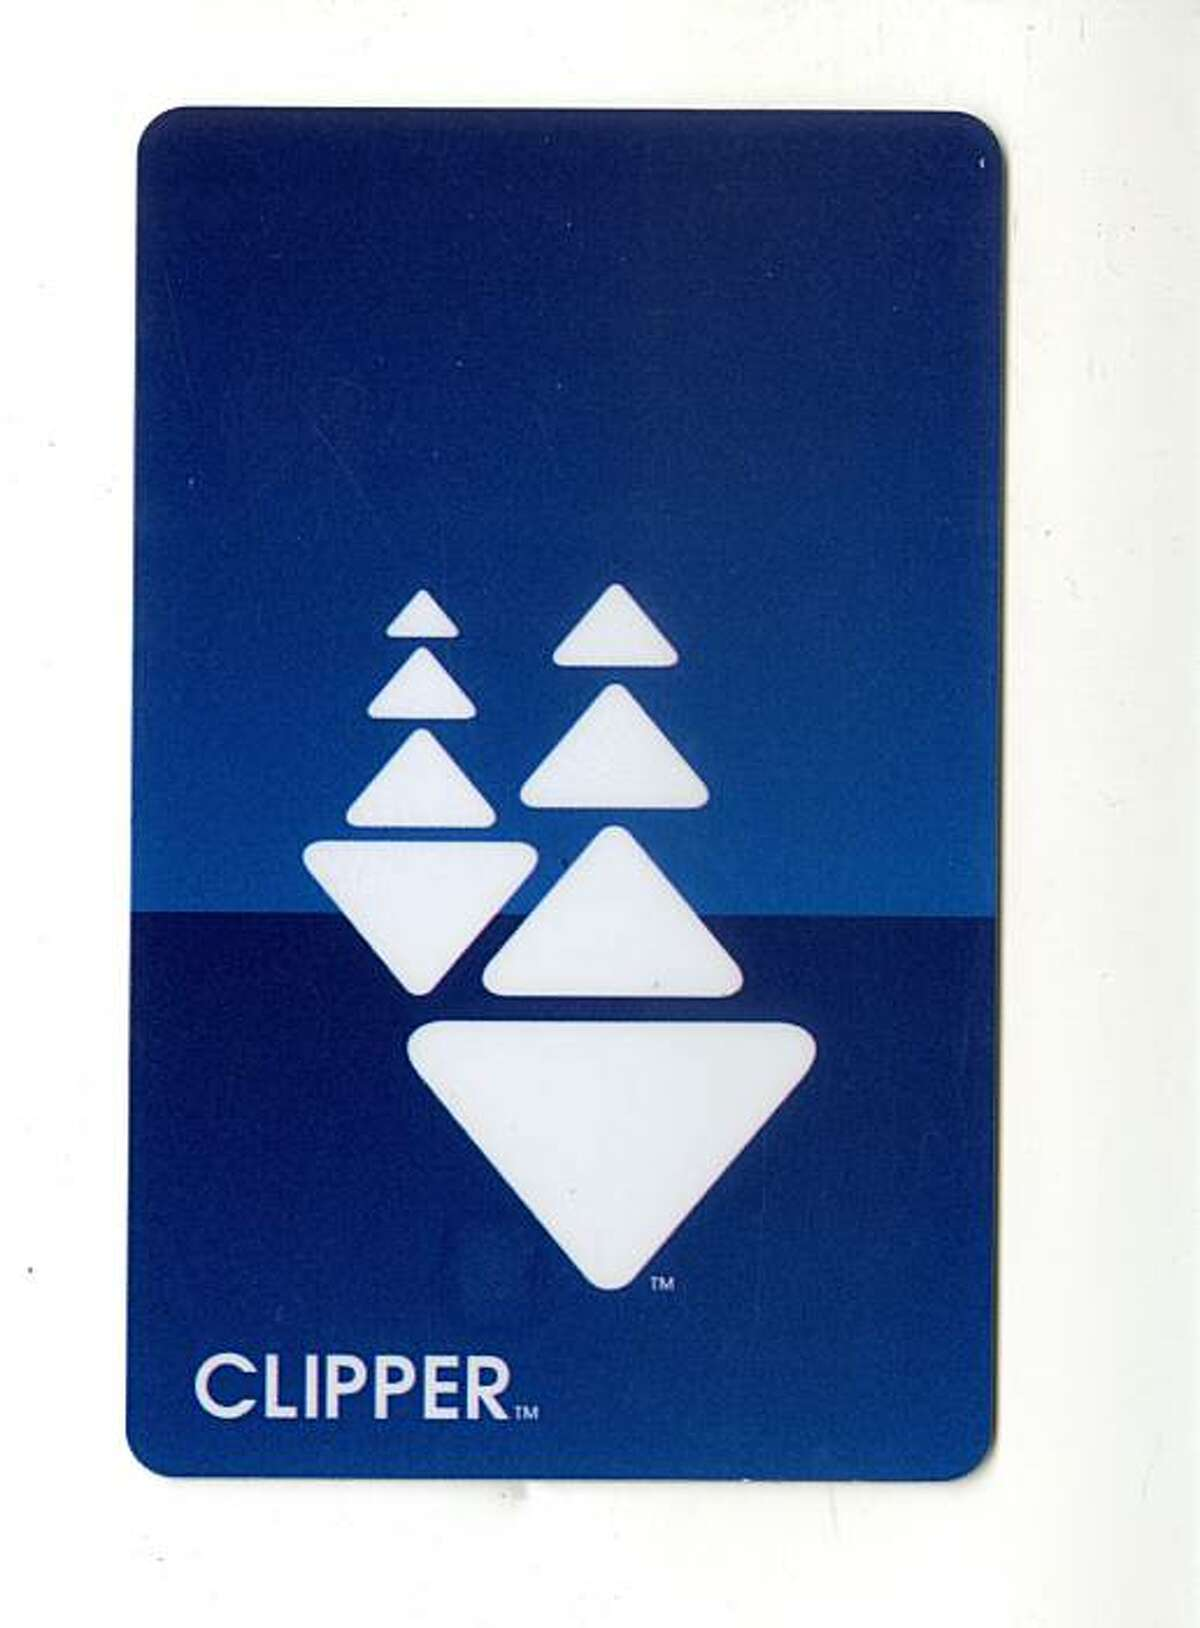 The Clipper transit card